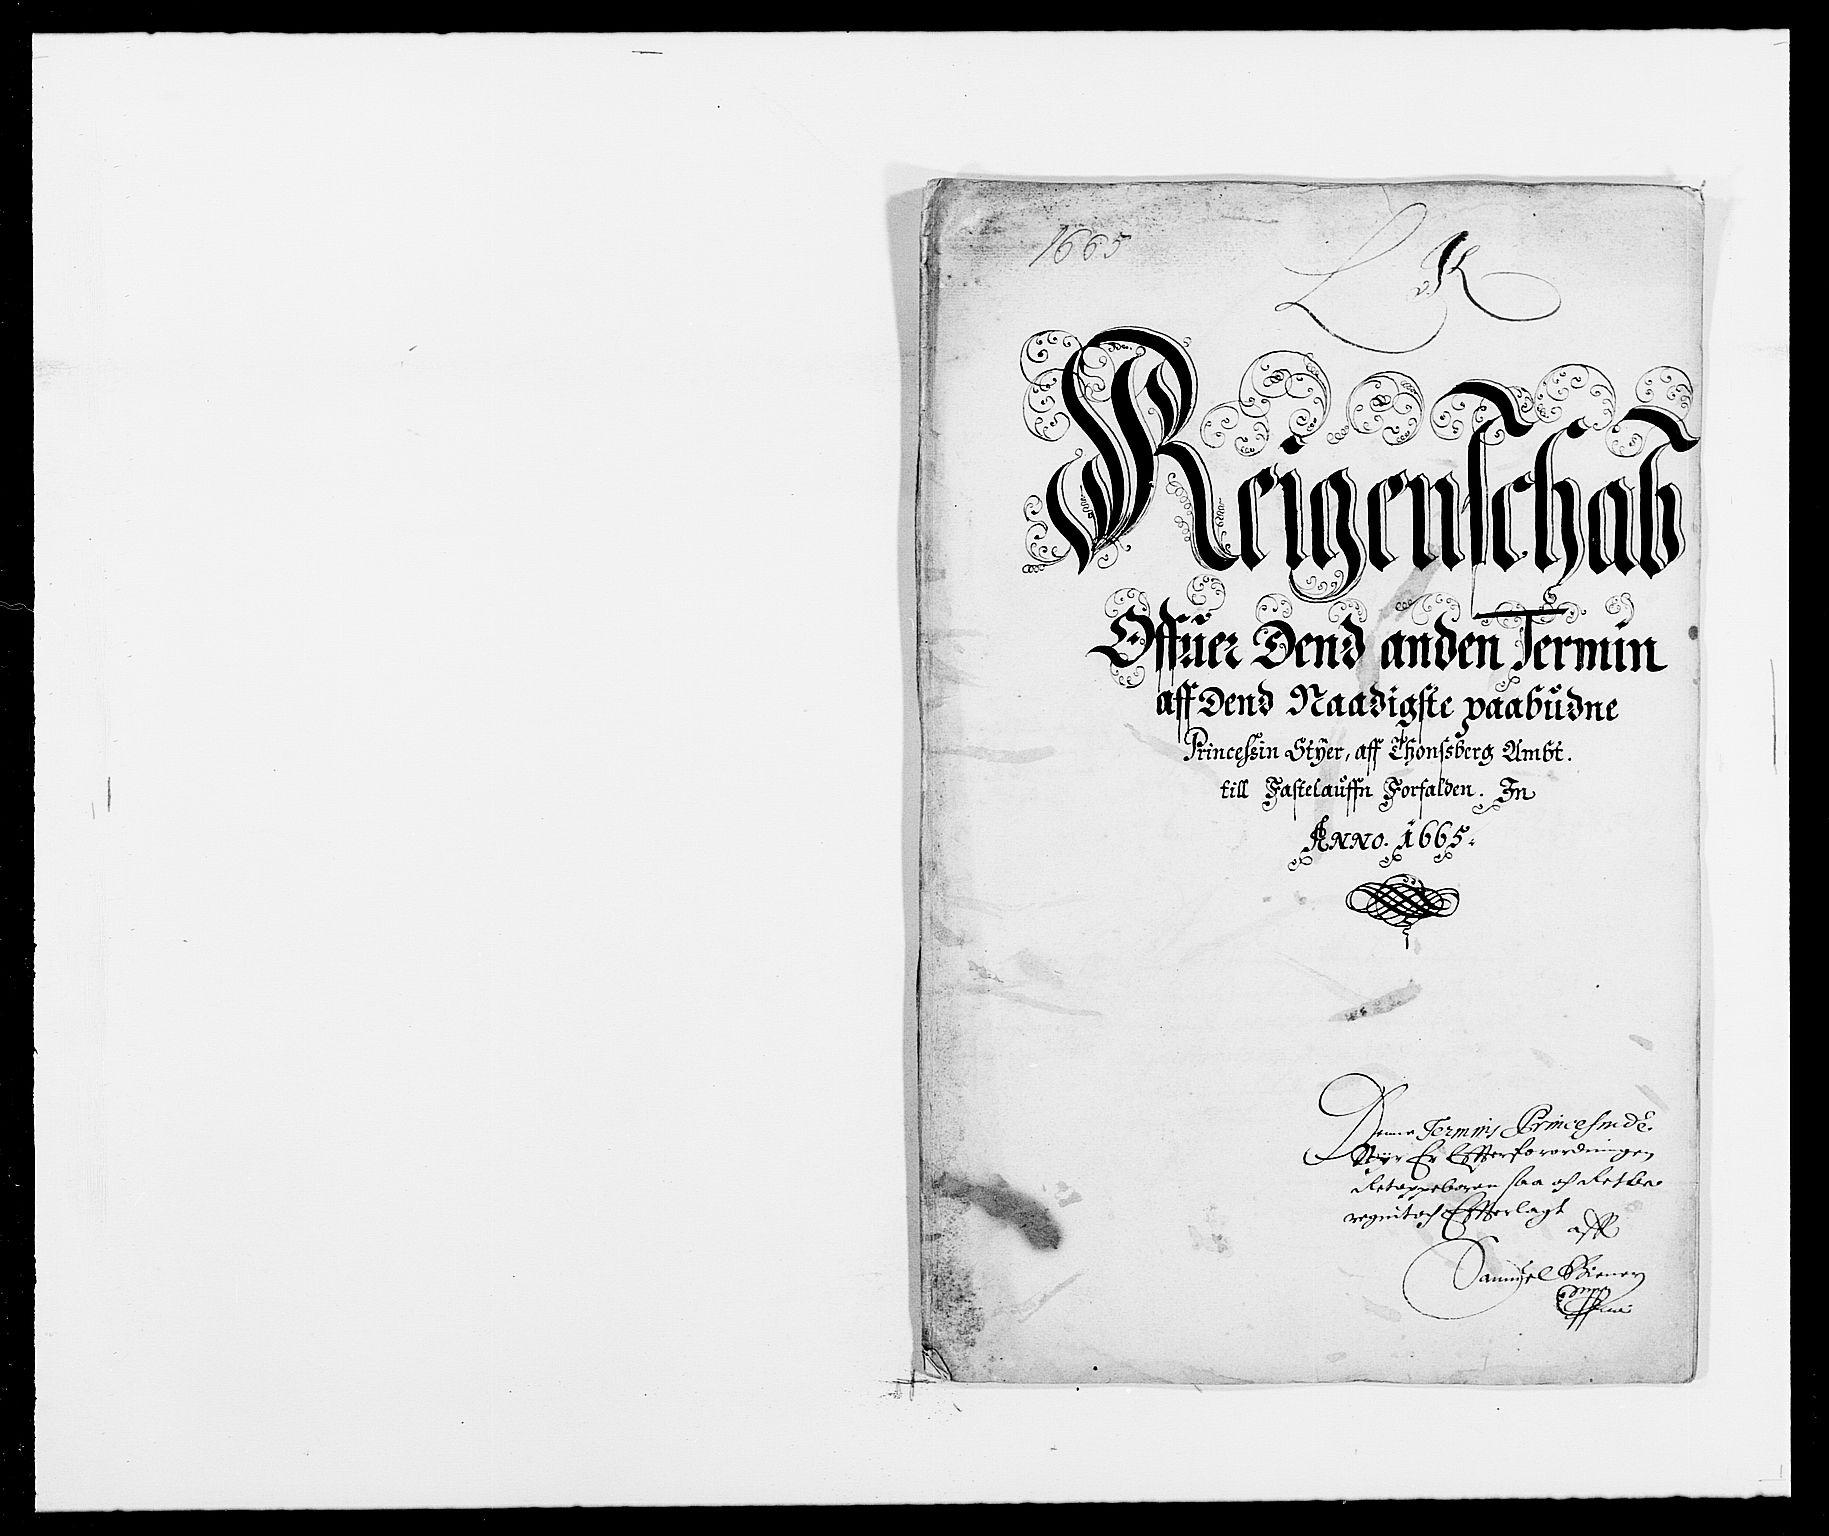 RA, Rentekammeret inntil 1814, Reviderte regnskaper, Fogderegnskap, R32/L1839: Fogderegnskap Jarlsberg grevskap, 1664-1673, s. 338